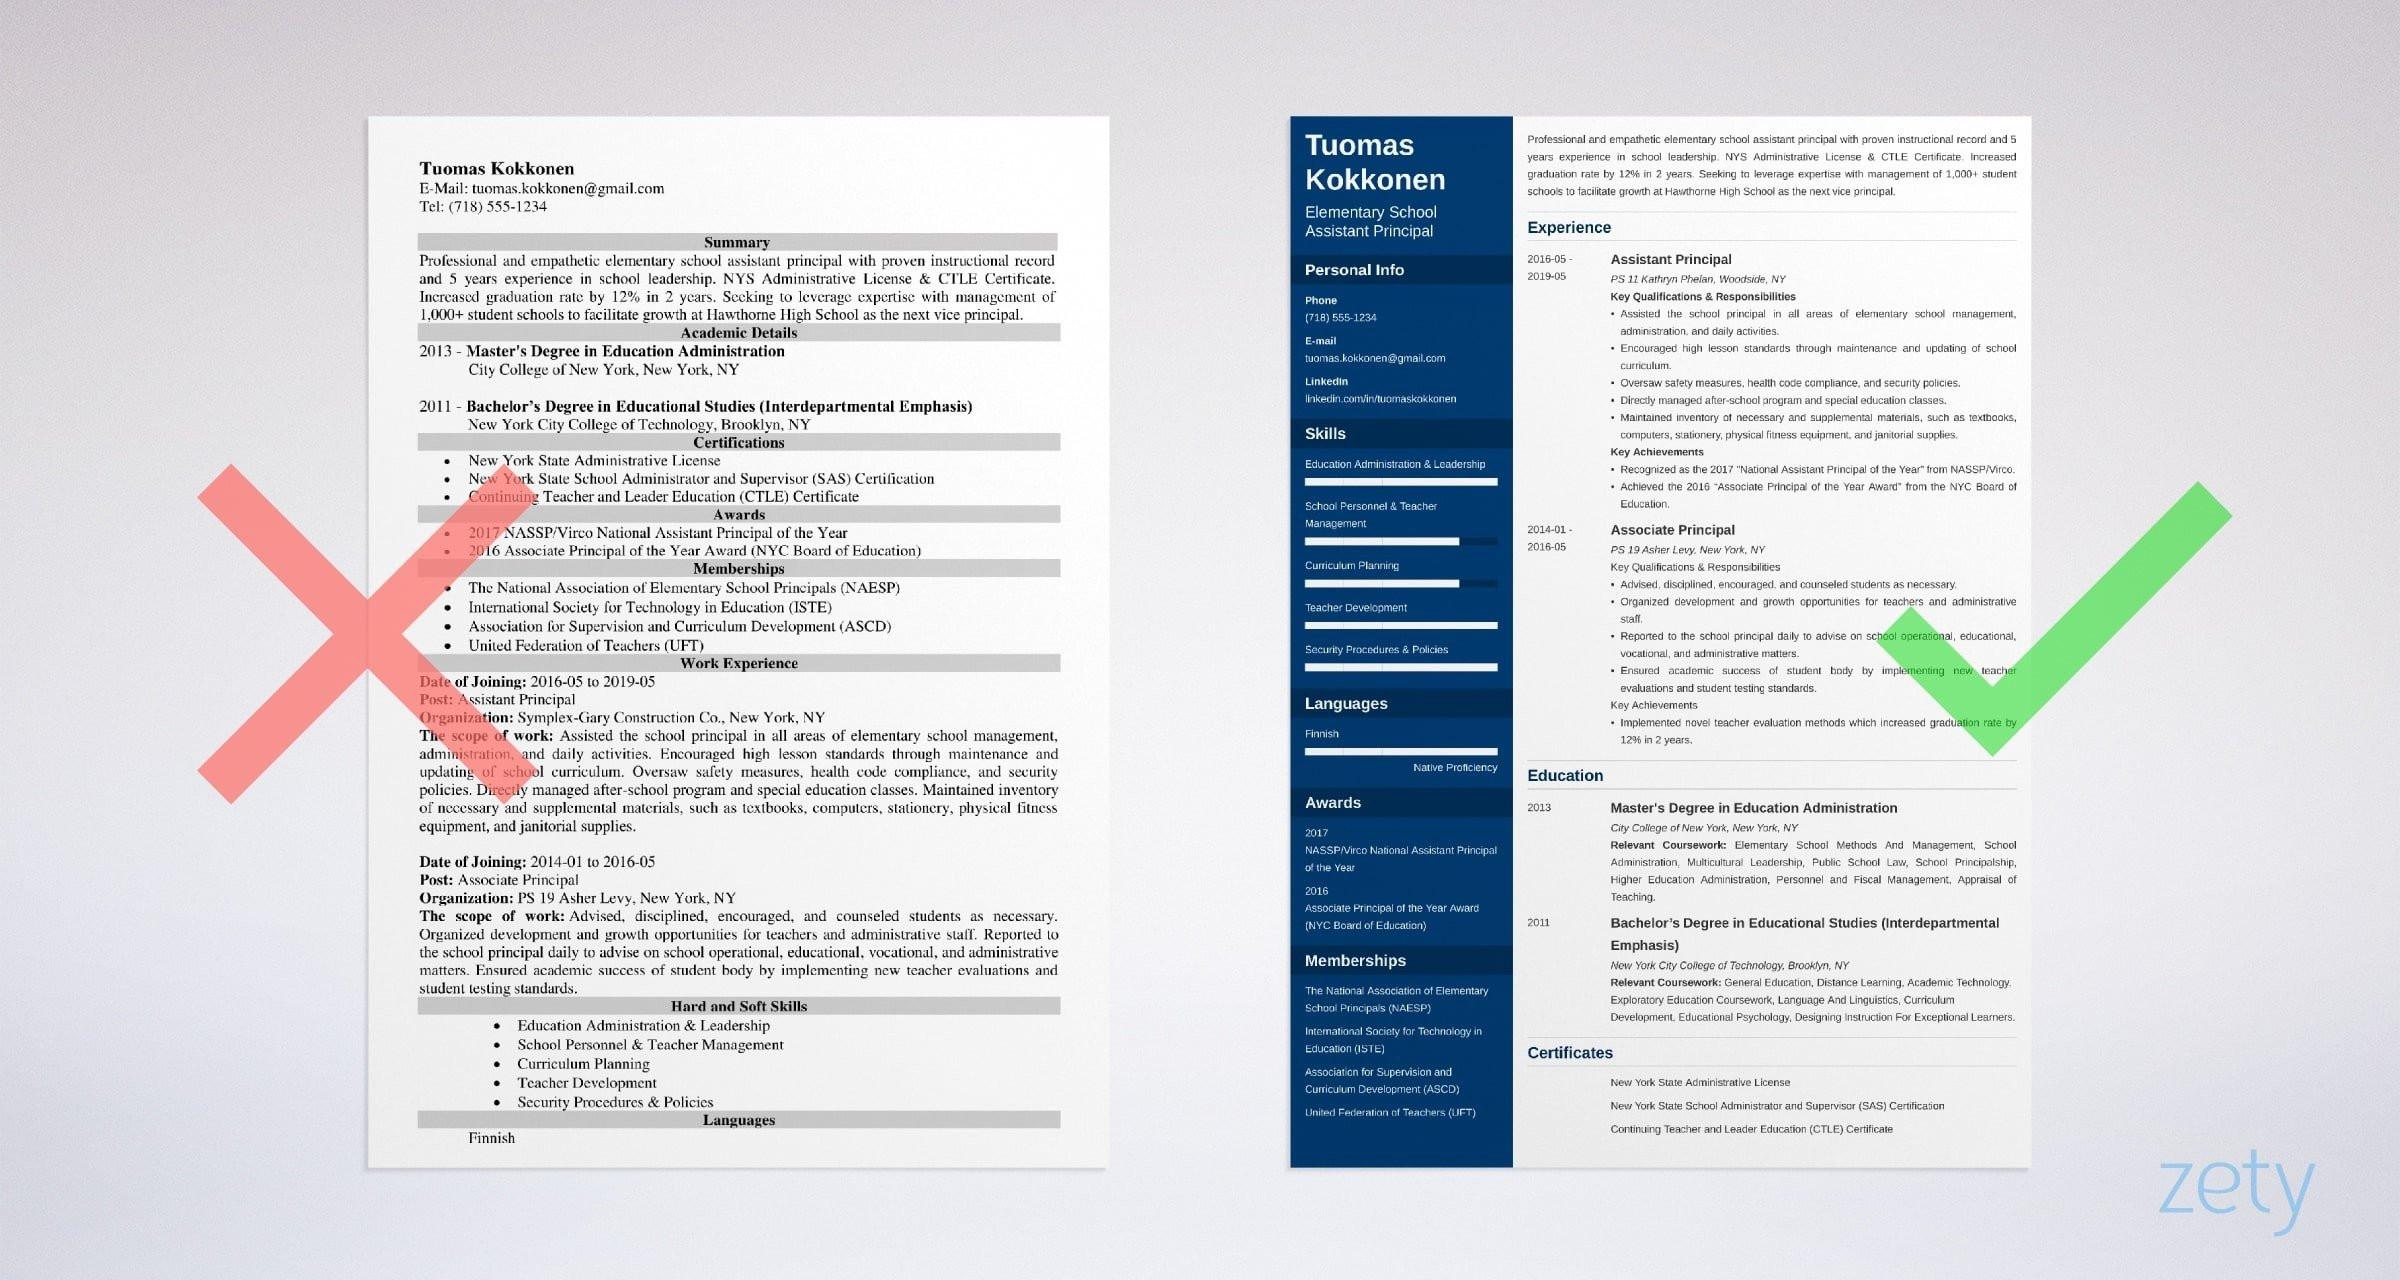 Sample Resume for School Principal Position In India assistant Principal Resume Template & Guide (20lancarrezekiq Examples)